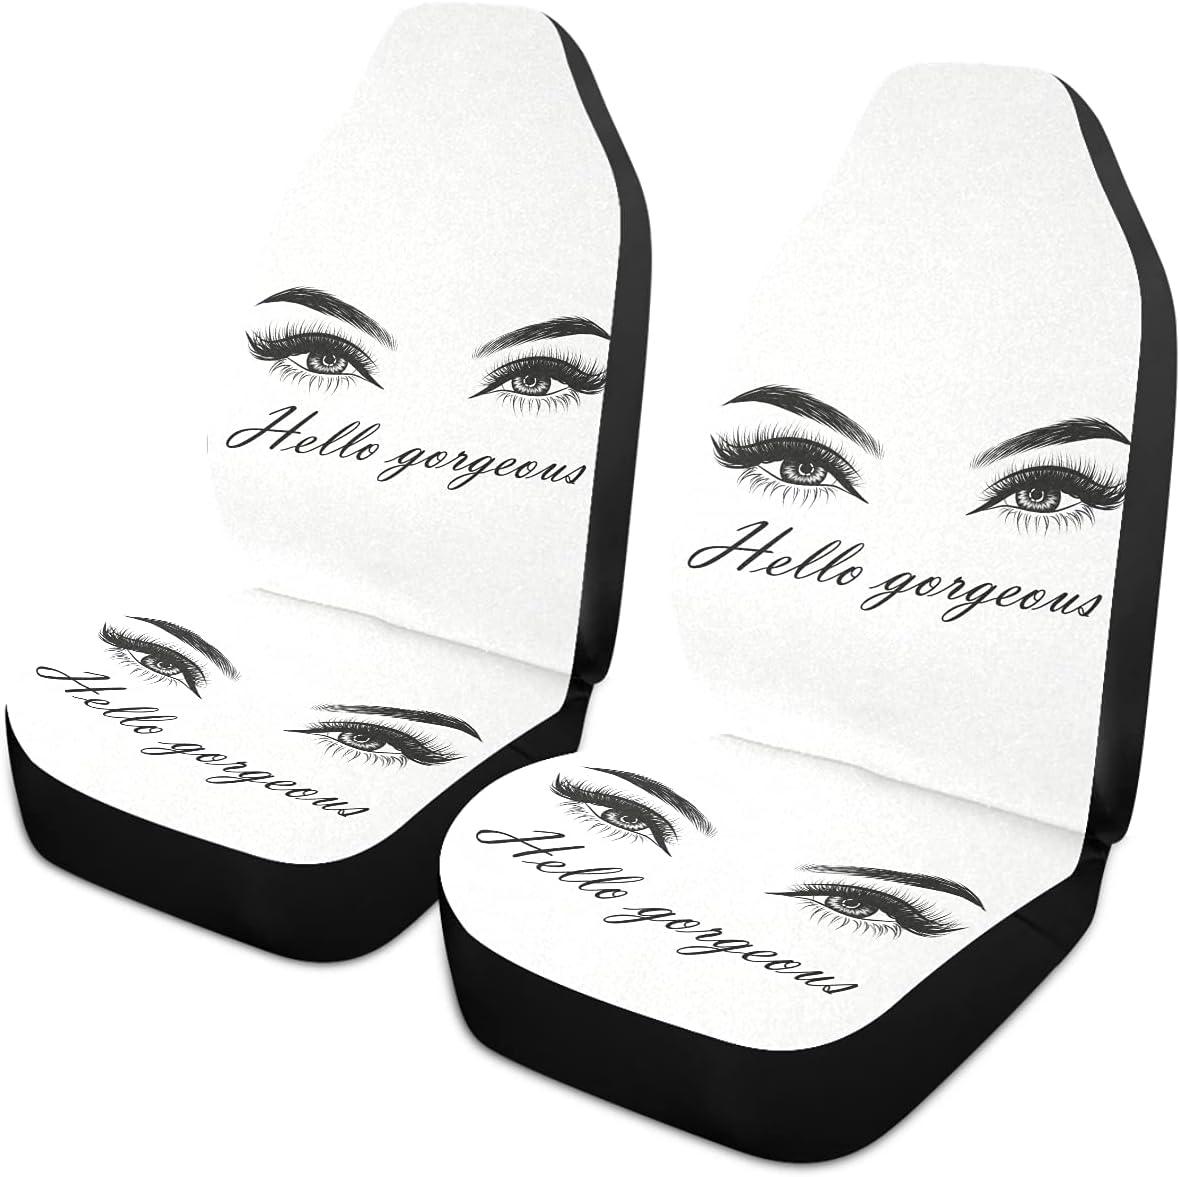 Oarencol Women Eyes Hello Gorgeous Covers service Car Universal Seat Aut Choice